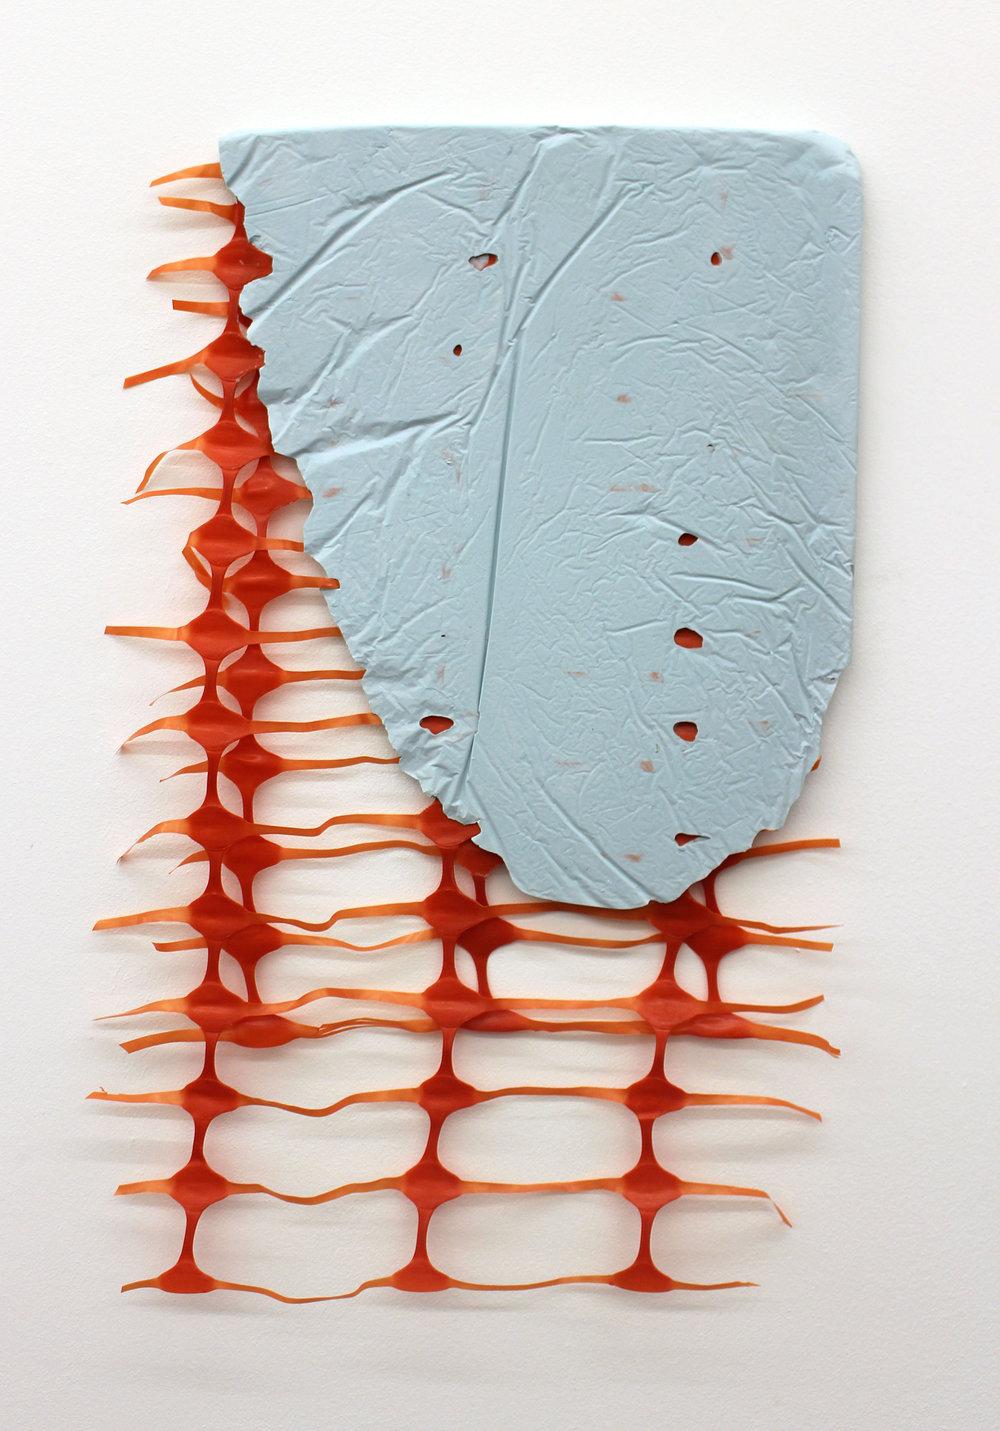 untitled fragment (blue,orange), 2016